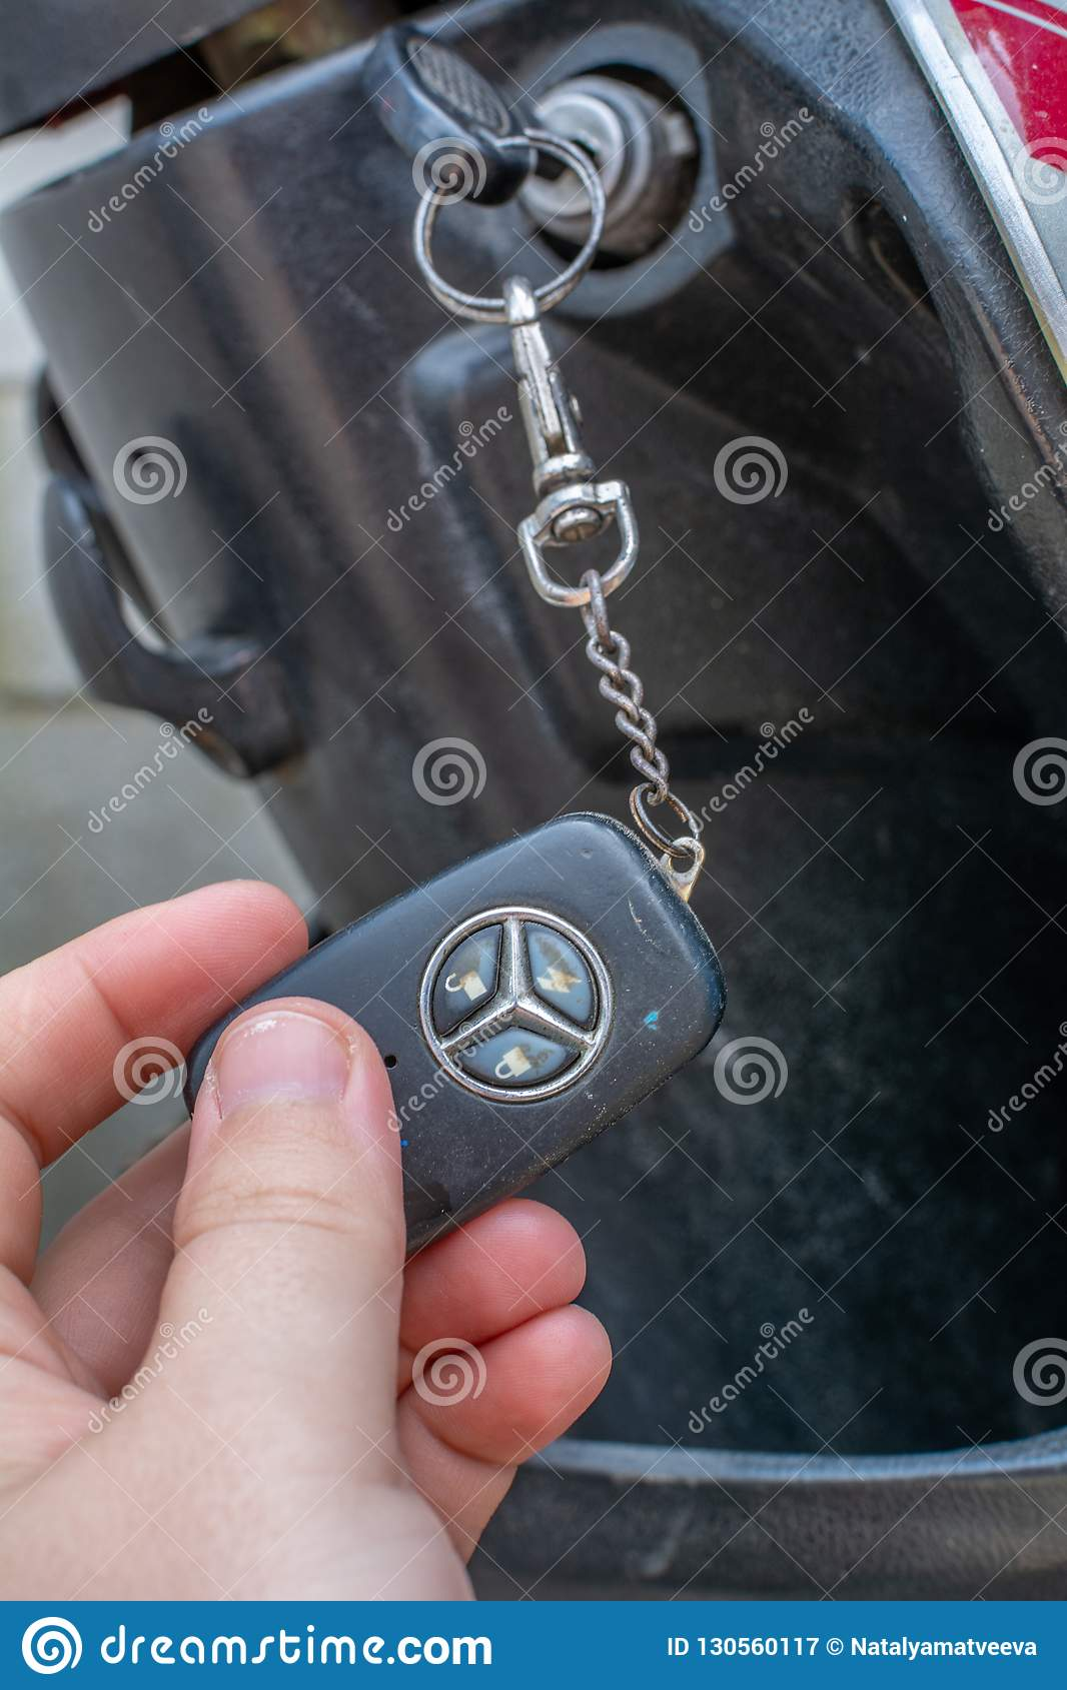 Motorcycle Ignition Key Switch Stock Image - Image of